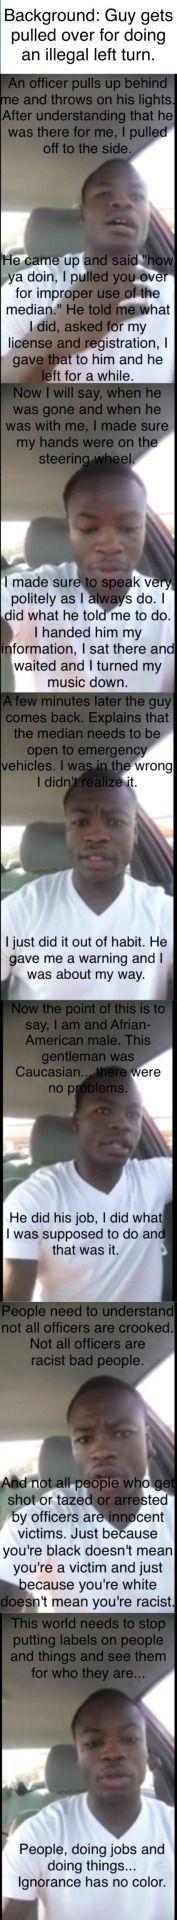 This man understands thank god